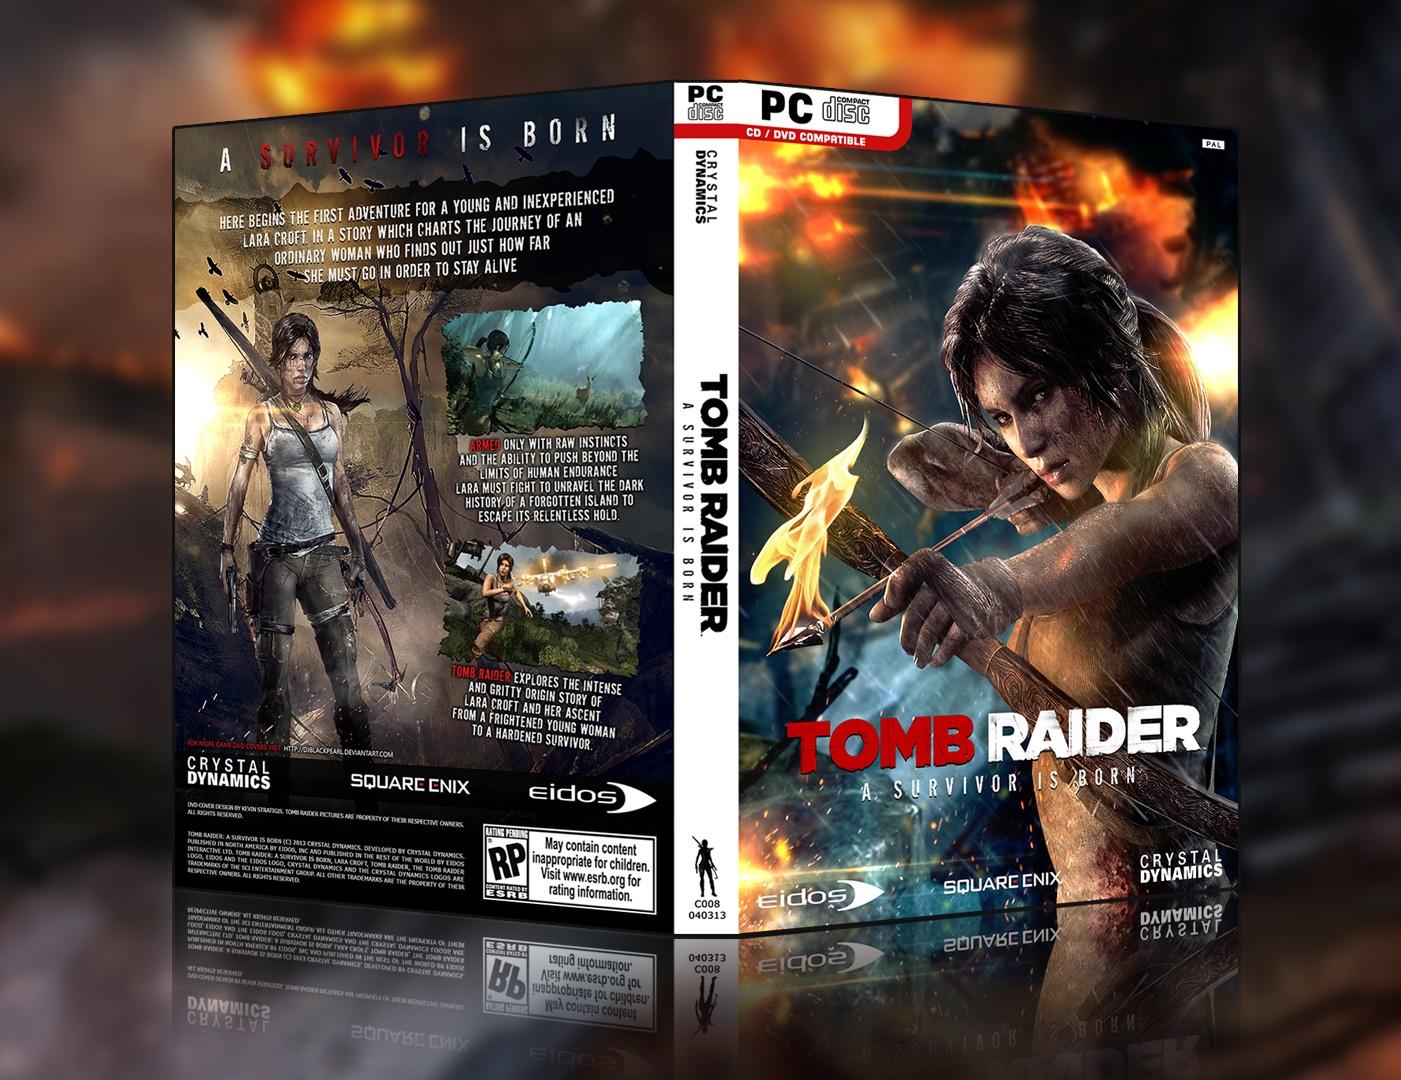 tomb raider pc box art cover by sl1kz